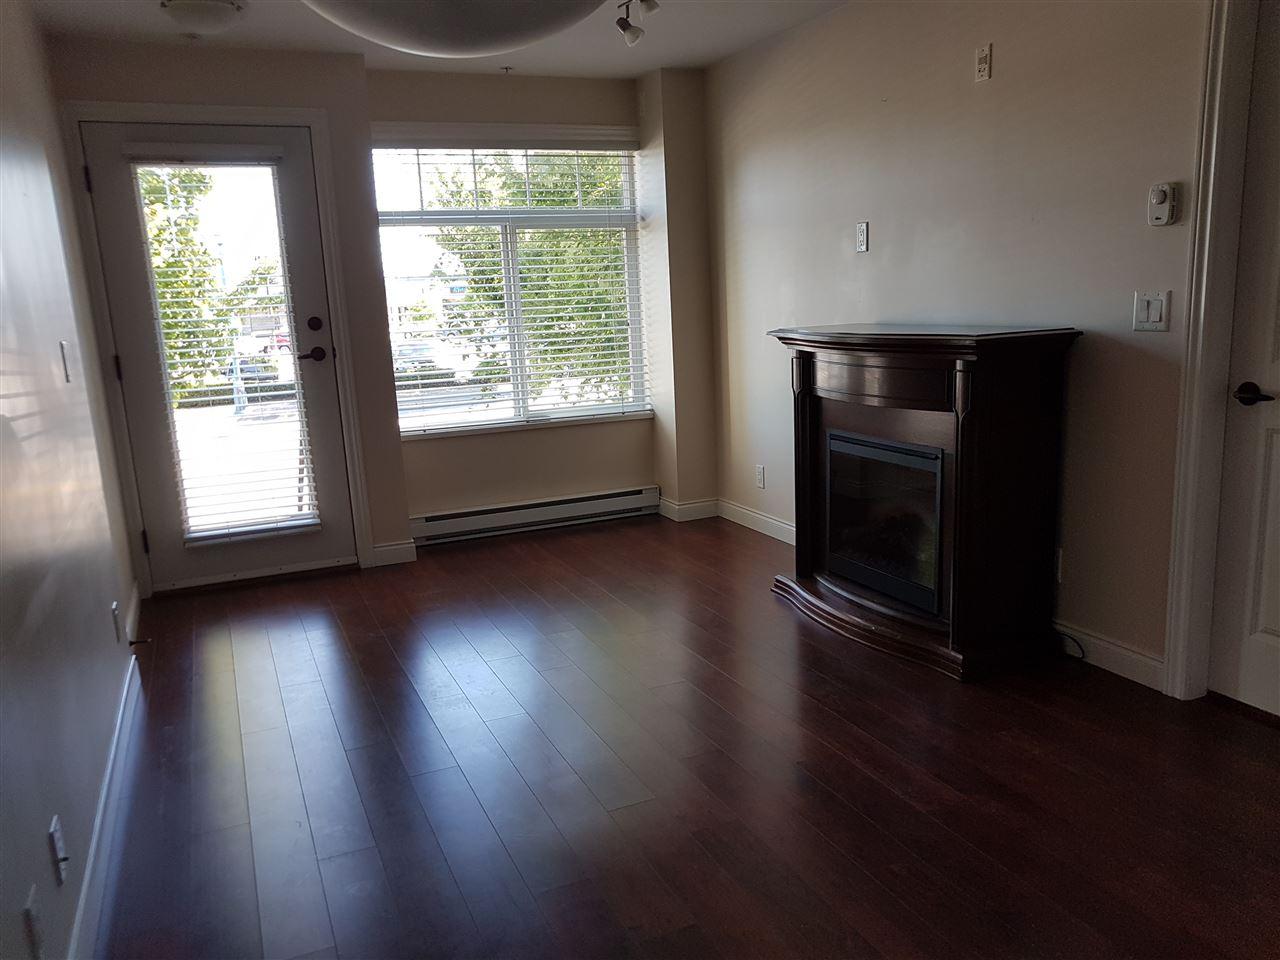 Condo Apartment at 273 20170 FRASER HIGHWAY, Unit 273, Langley, British Columbia. Image 3